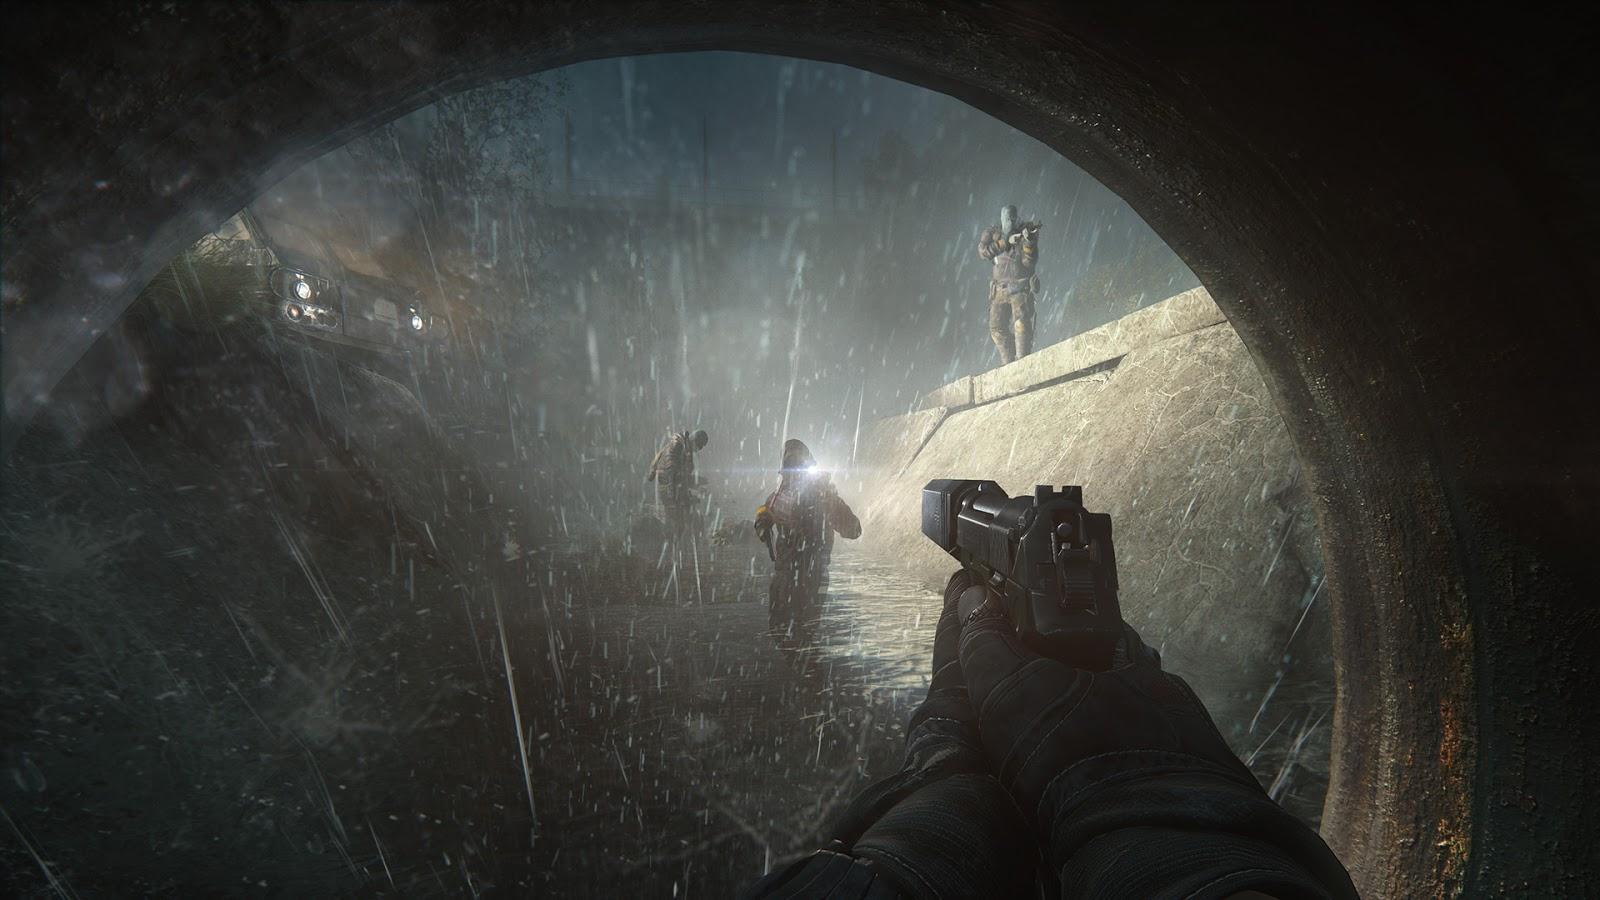 Sniper Ghost Warrior 3 ESPAÑOL PC (CPY) + Update v1.08 (PLAZA) + REPACK 10 DVD5 (JPW) 10